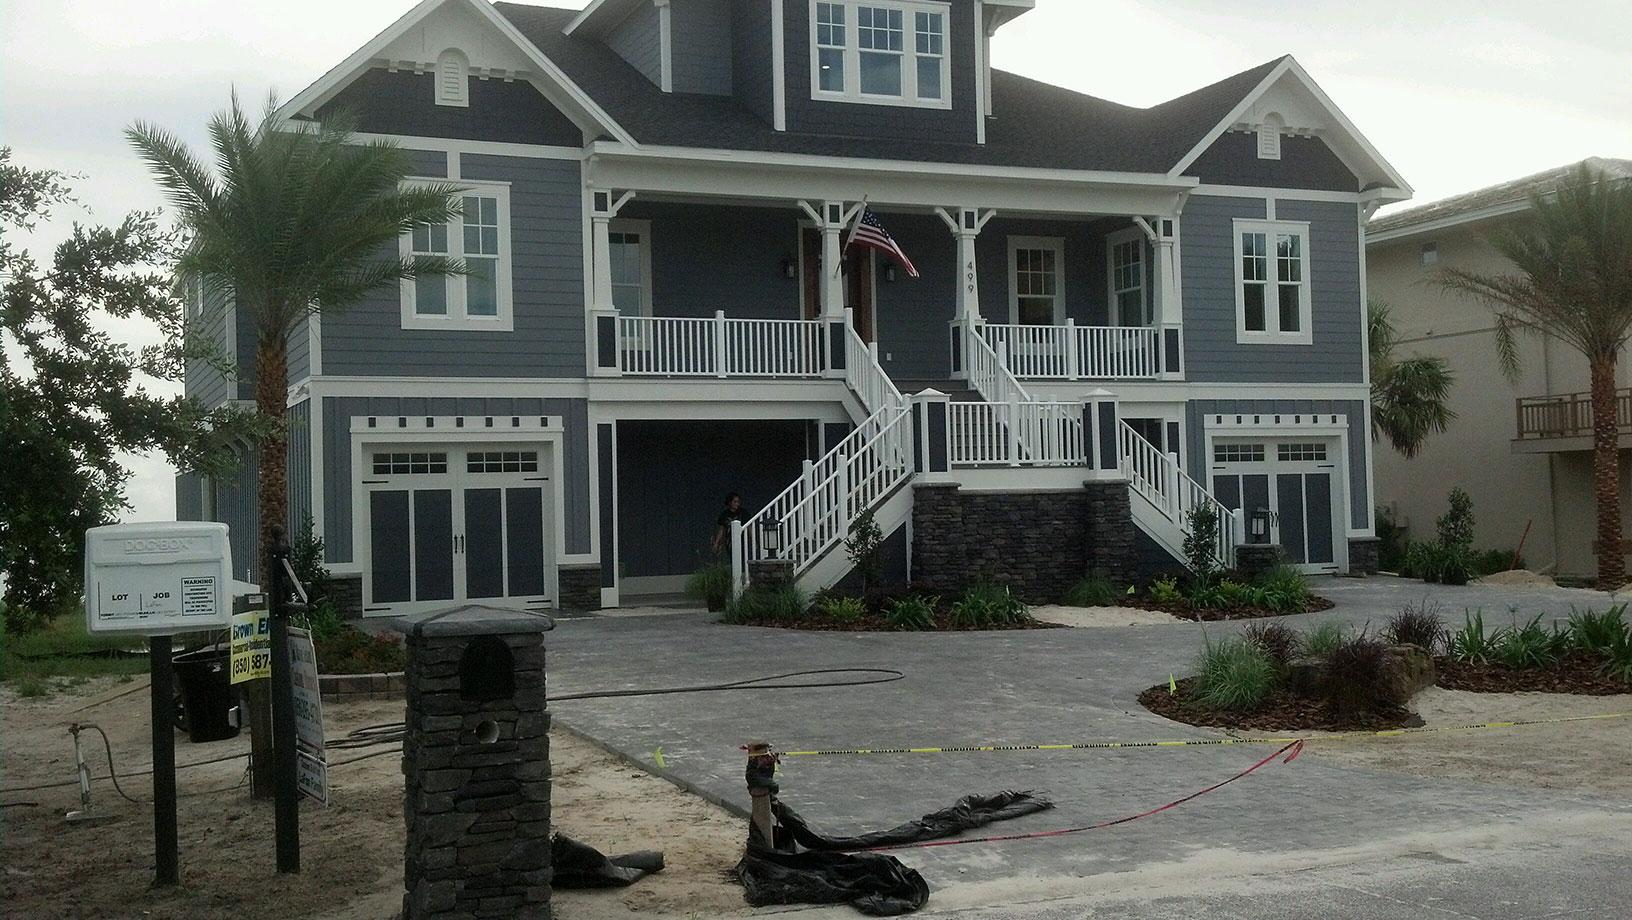 About leland custom homes leland custom homes for Leland house